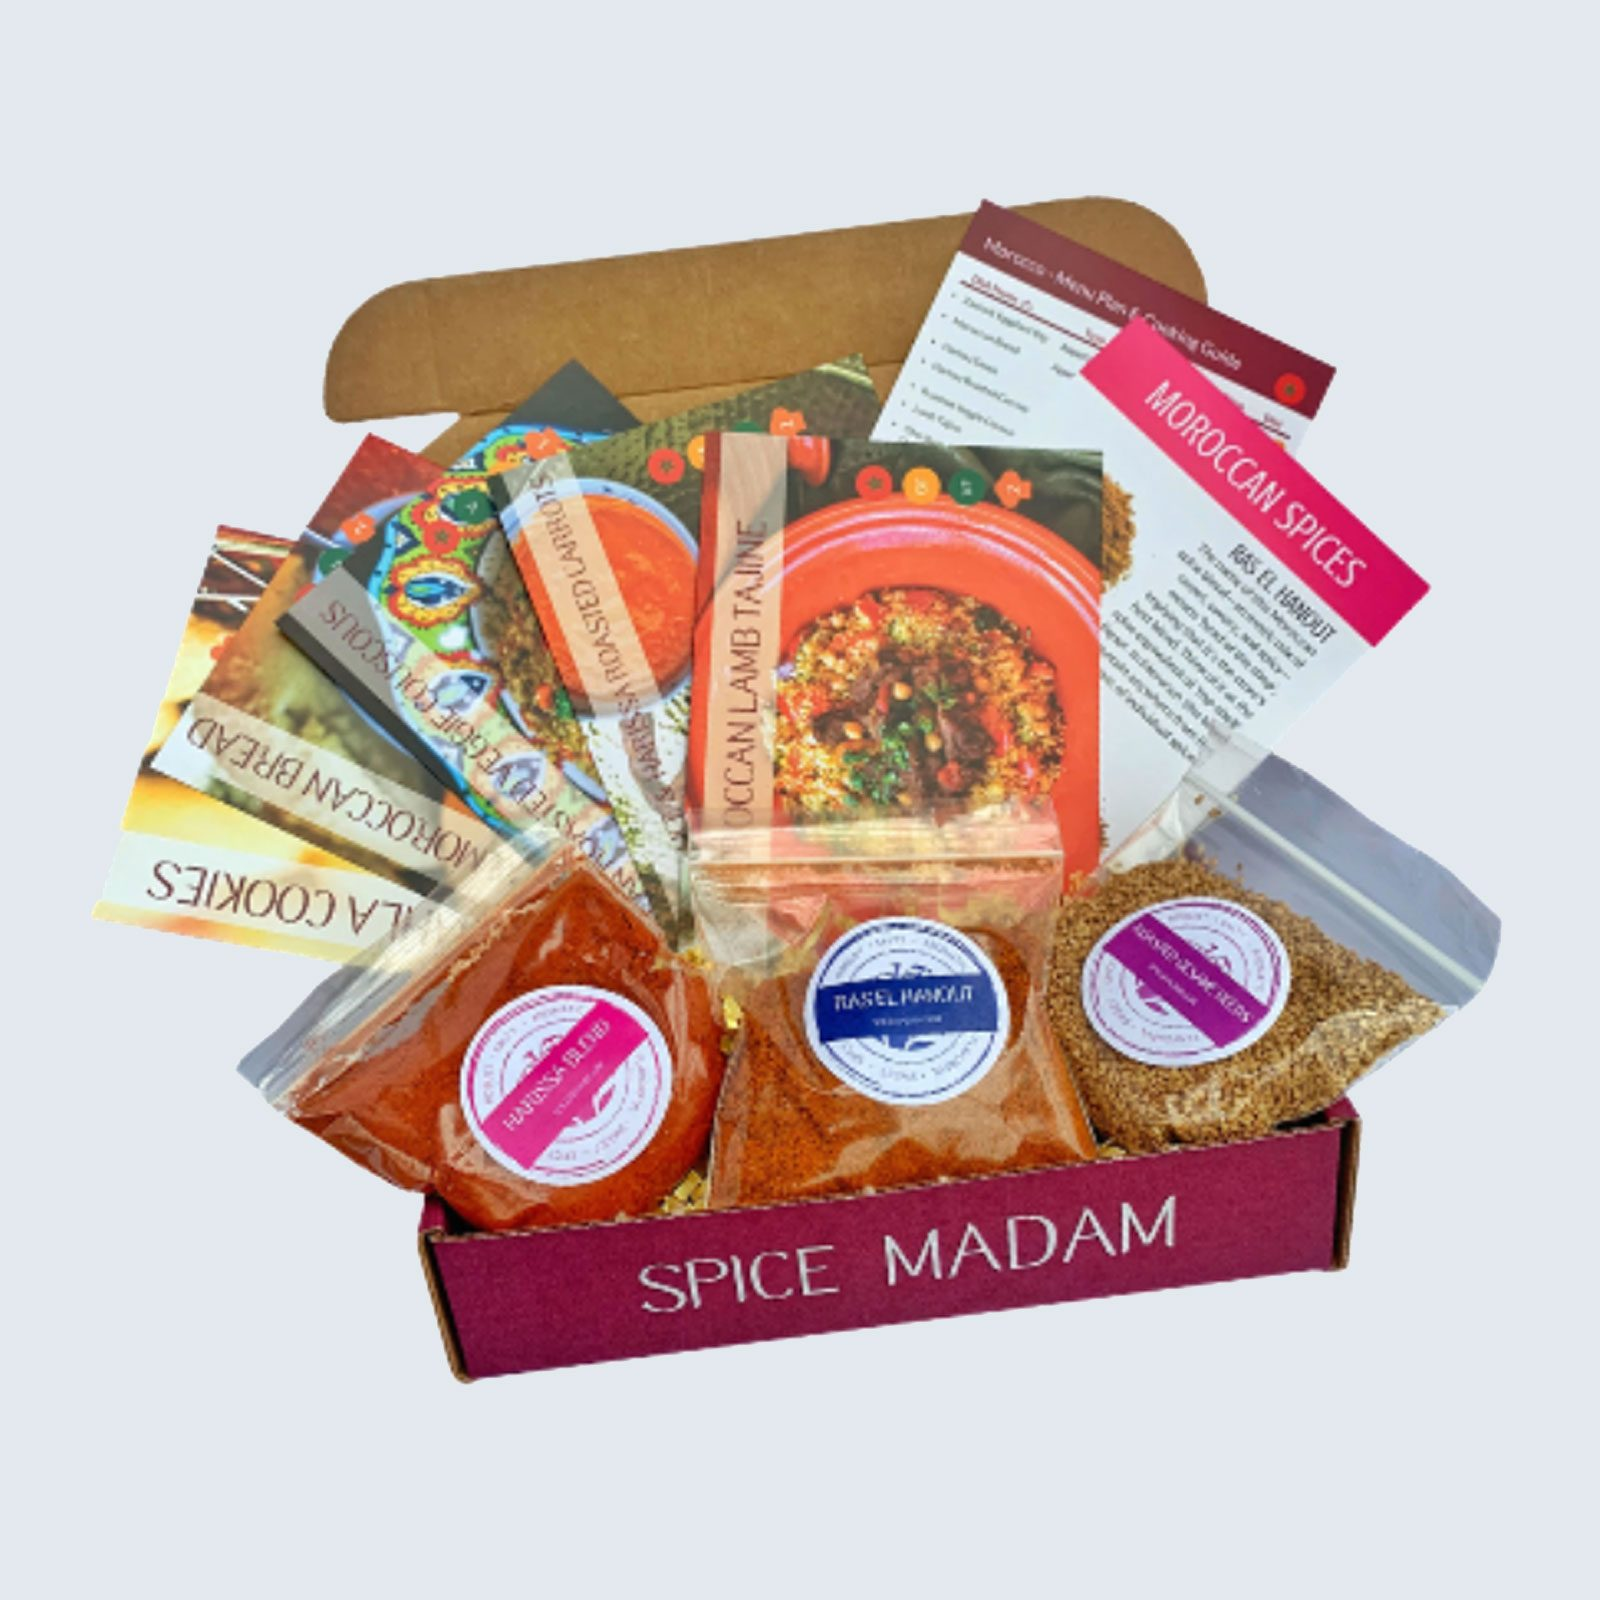 Spice Madam Subscription